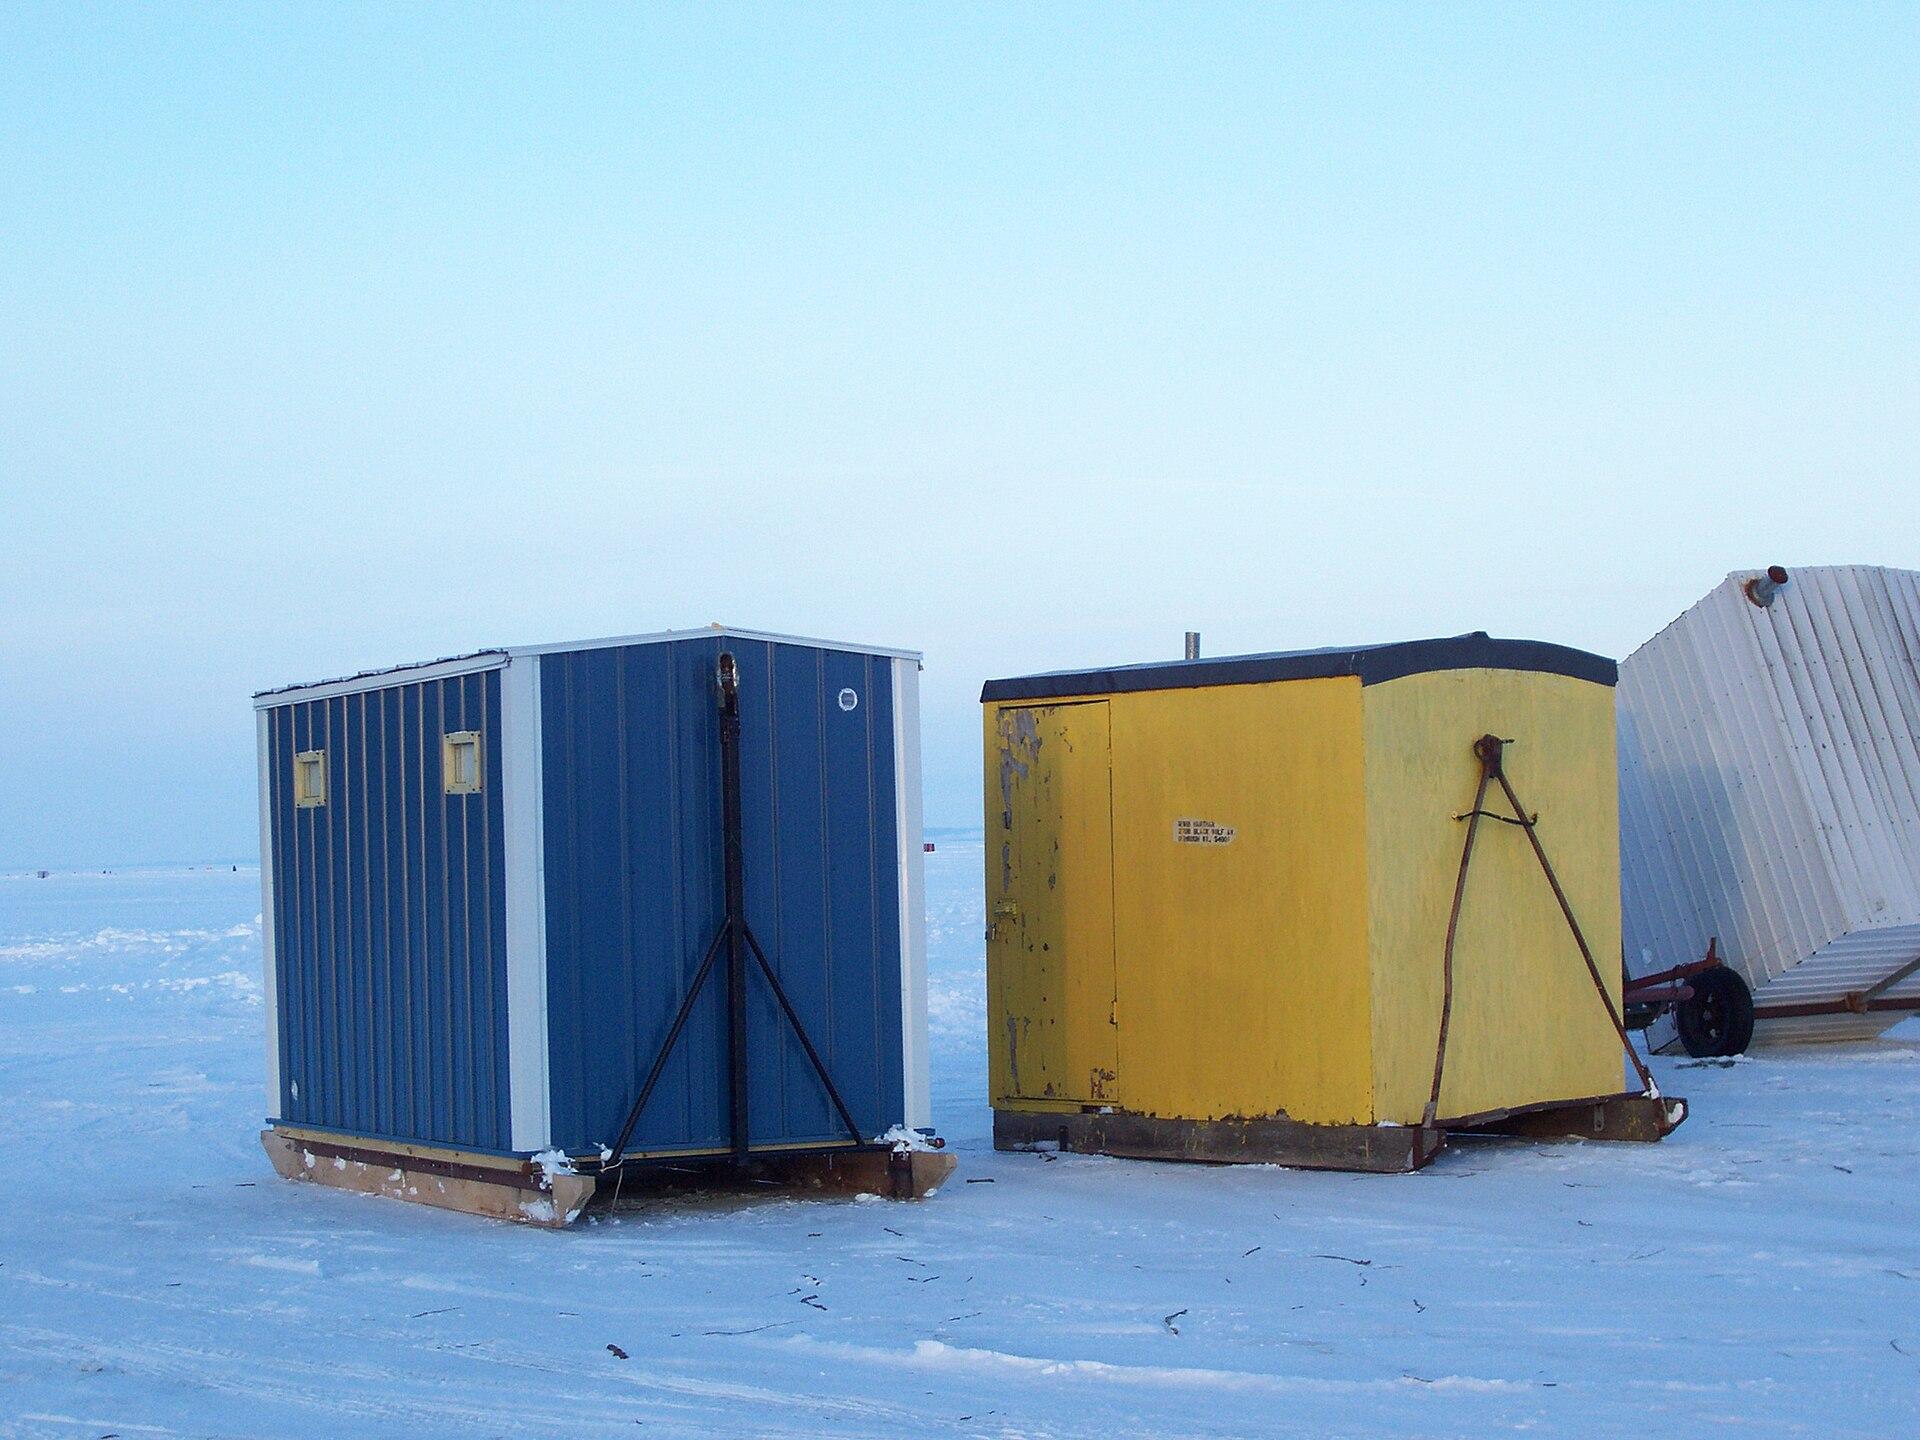 Ice Fishing Shanty Building Plans